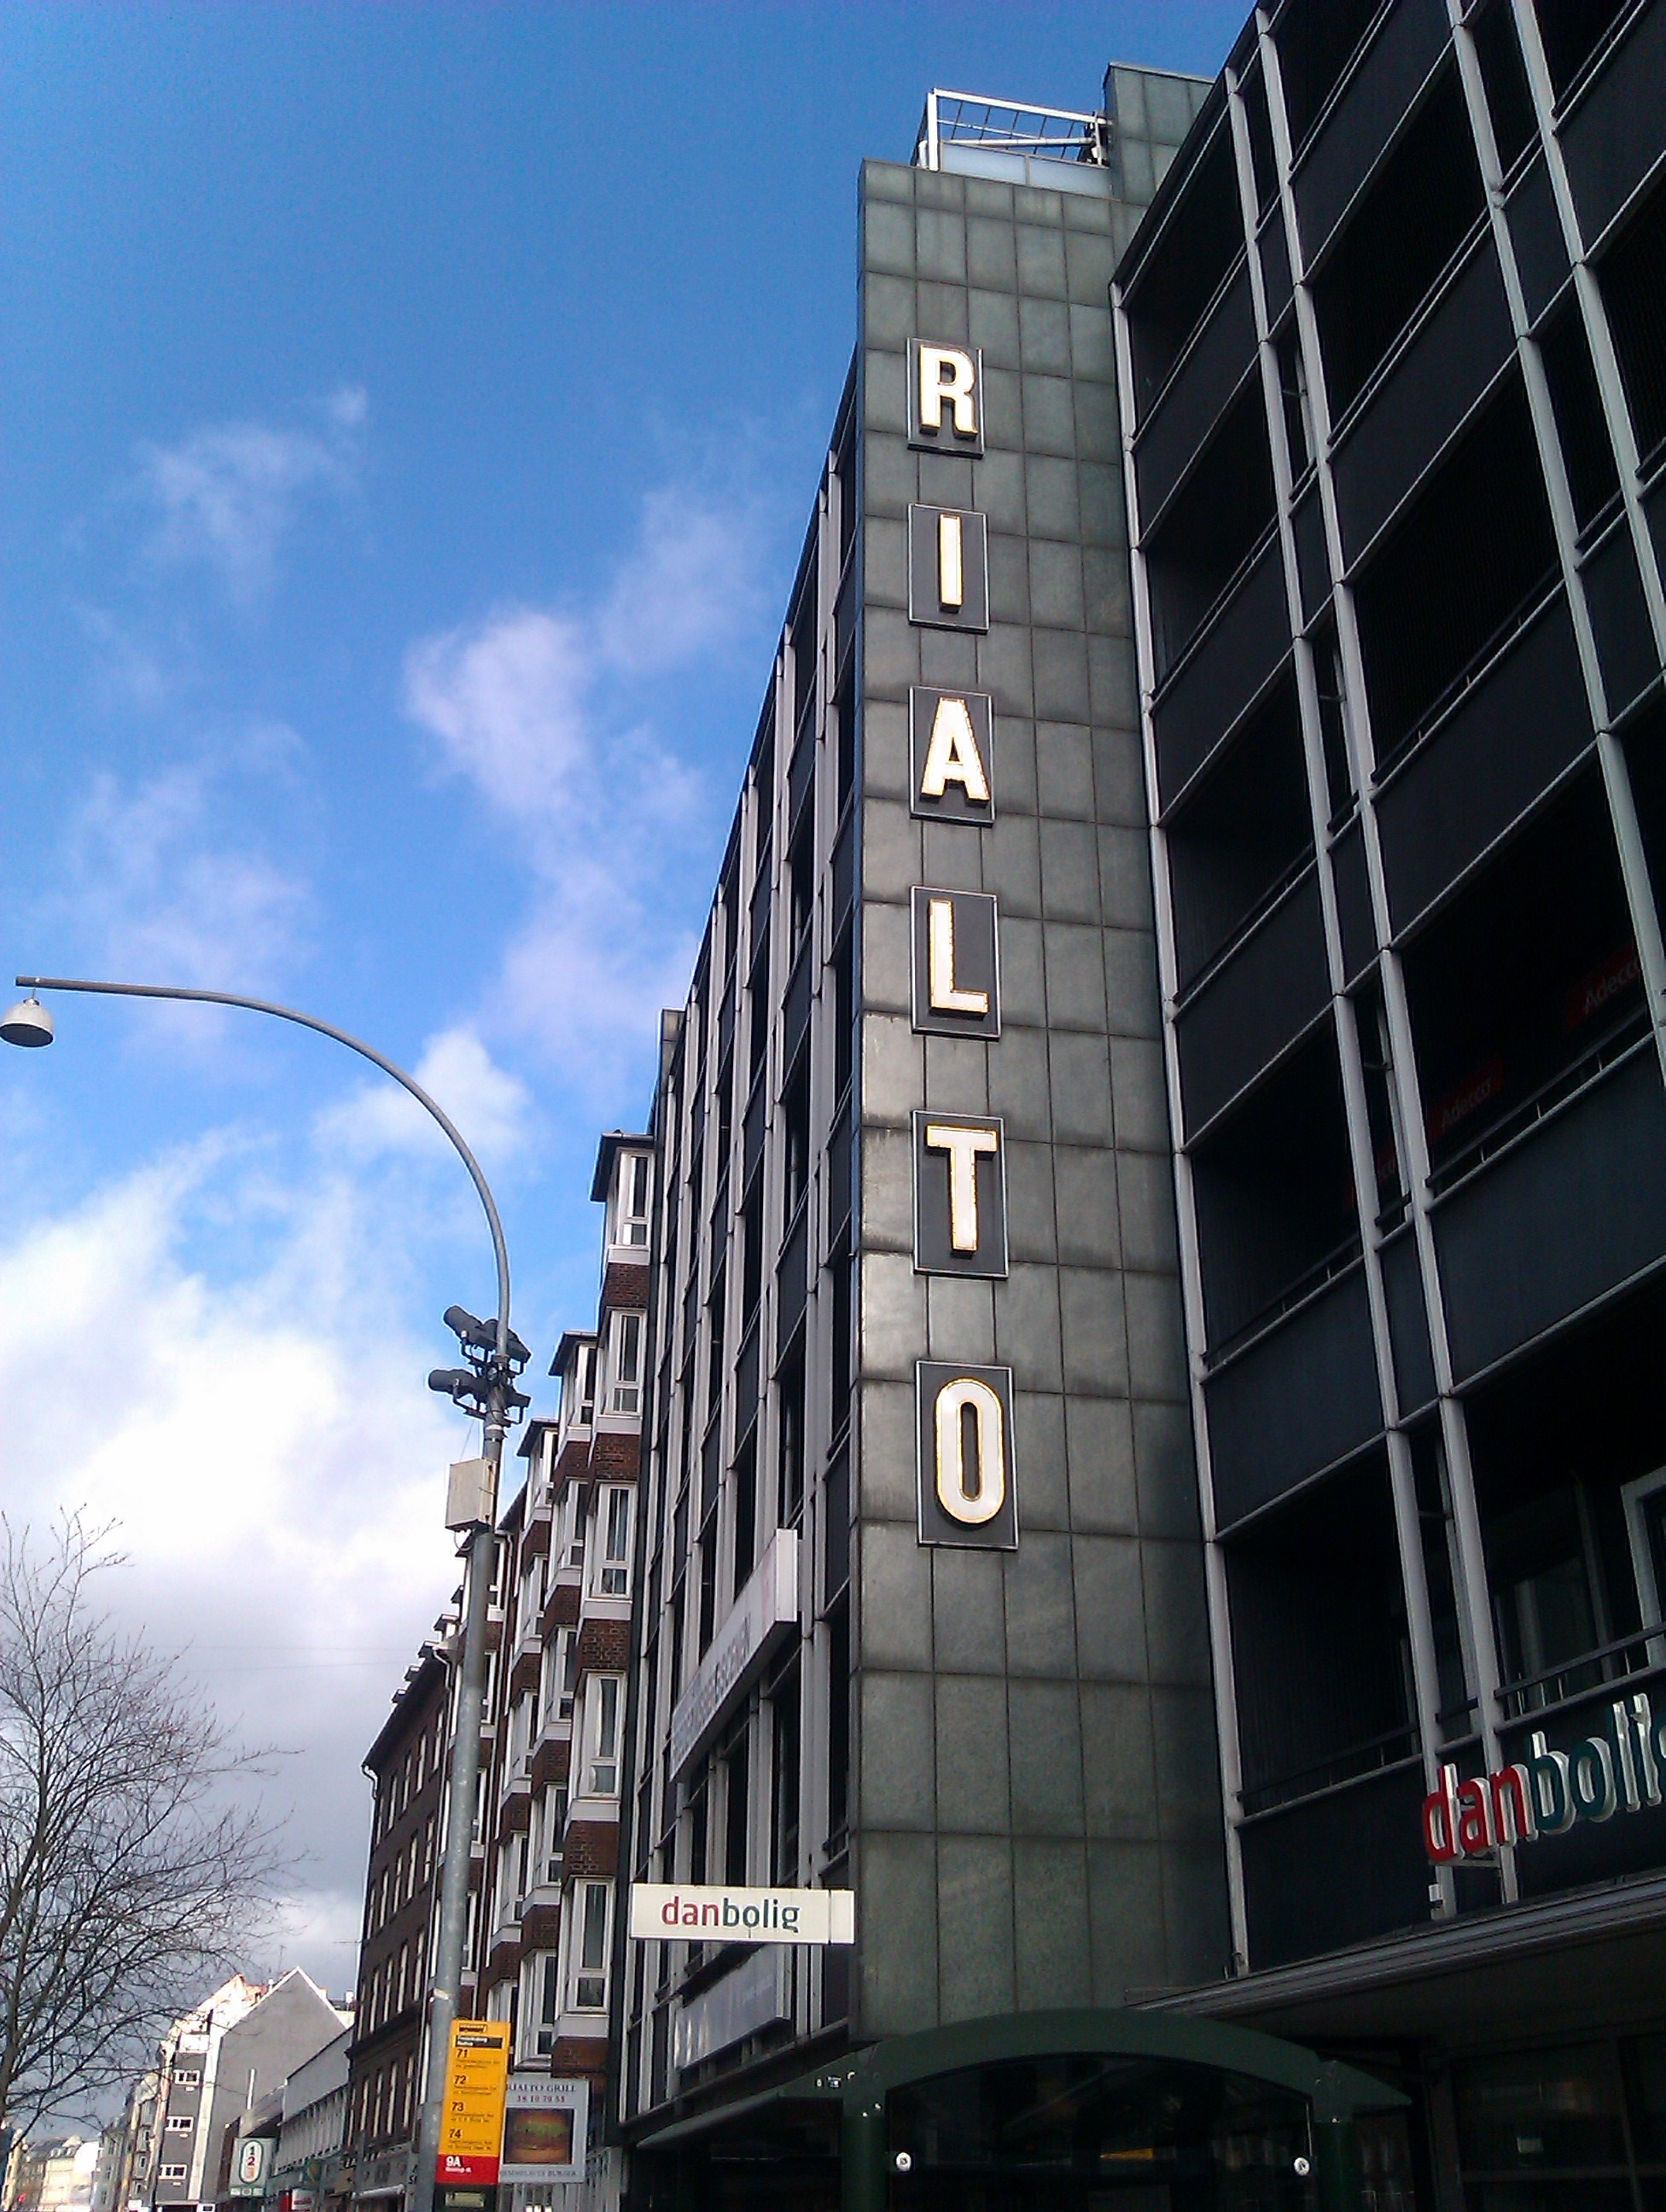 rialto teatret frederiksberg